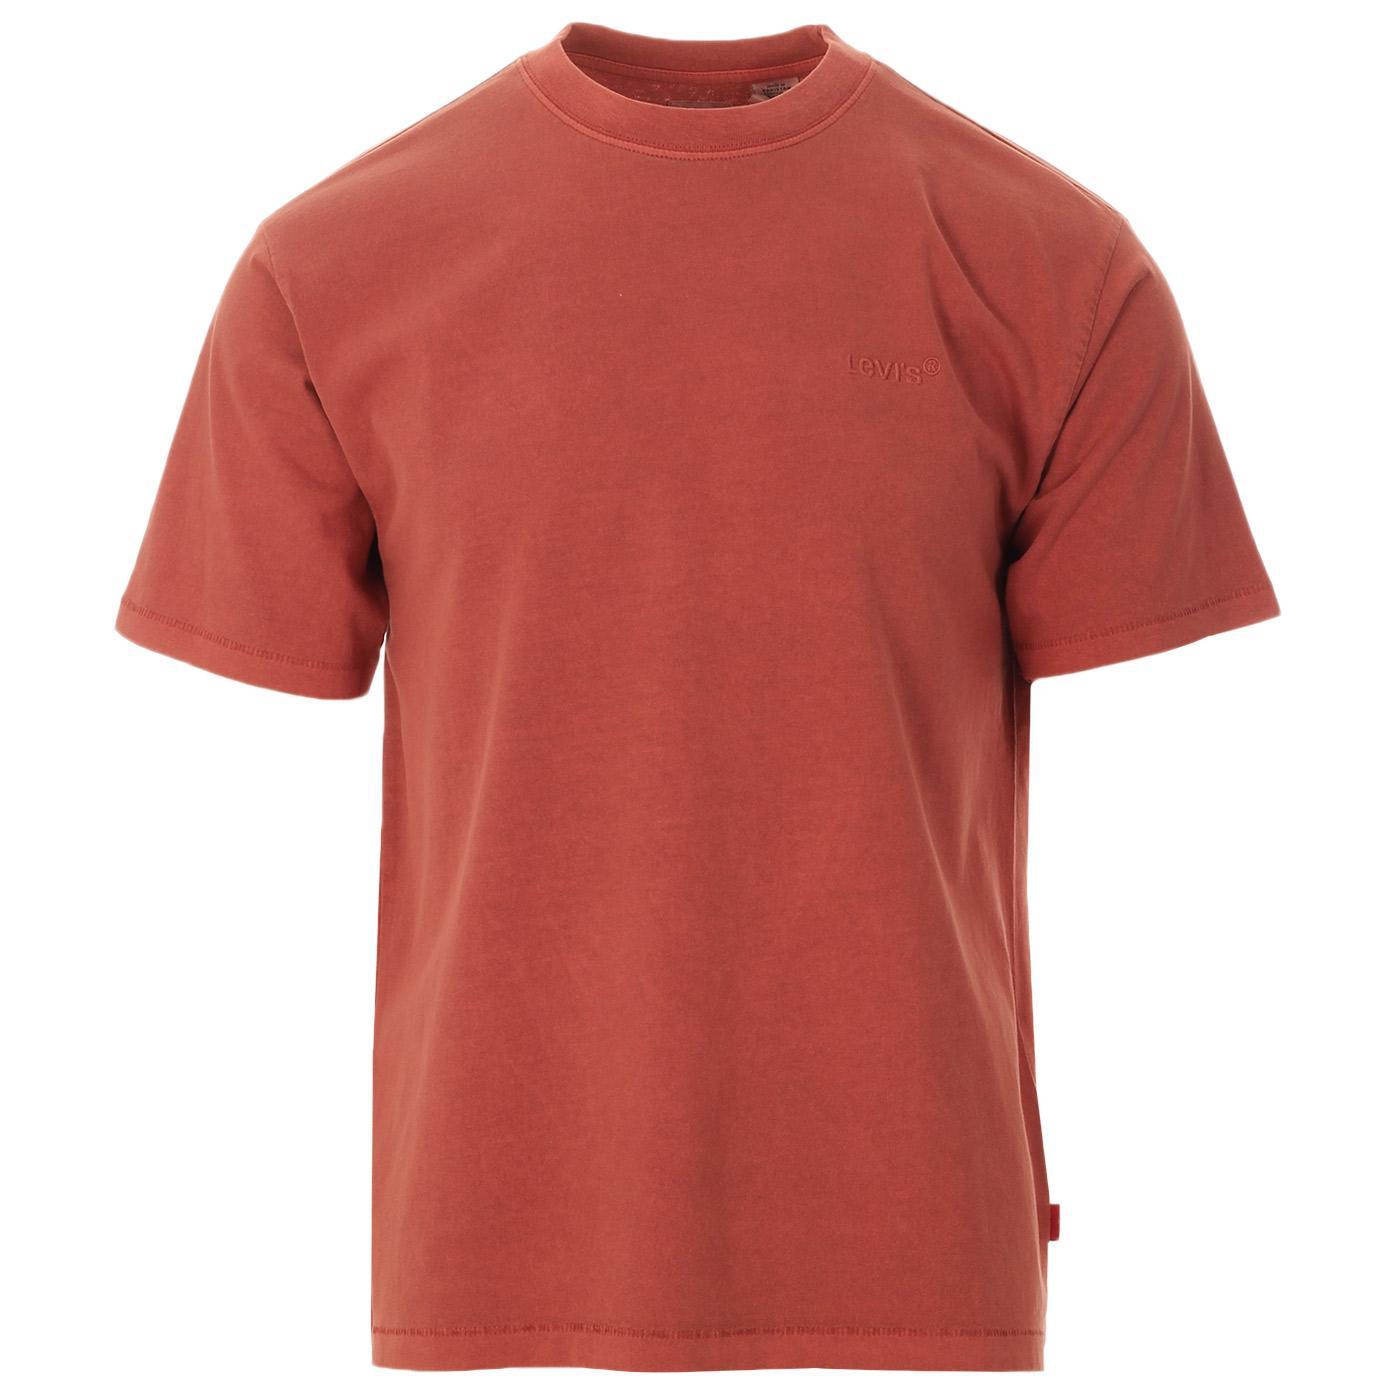 LEVI'S Red Tab Vintage Garment Dyed Tee (Marsala)